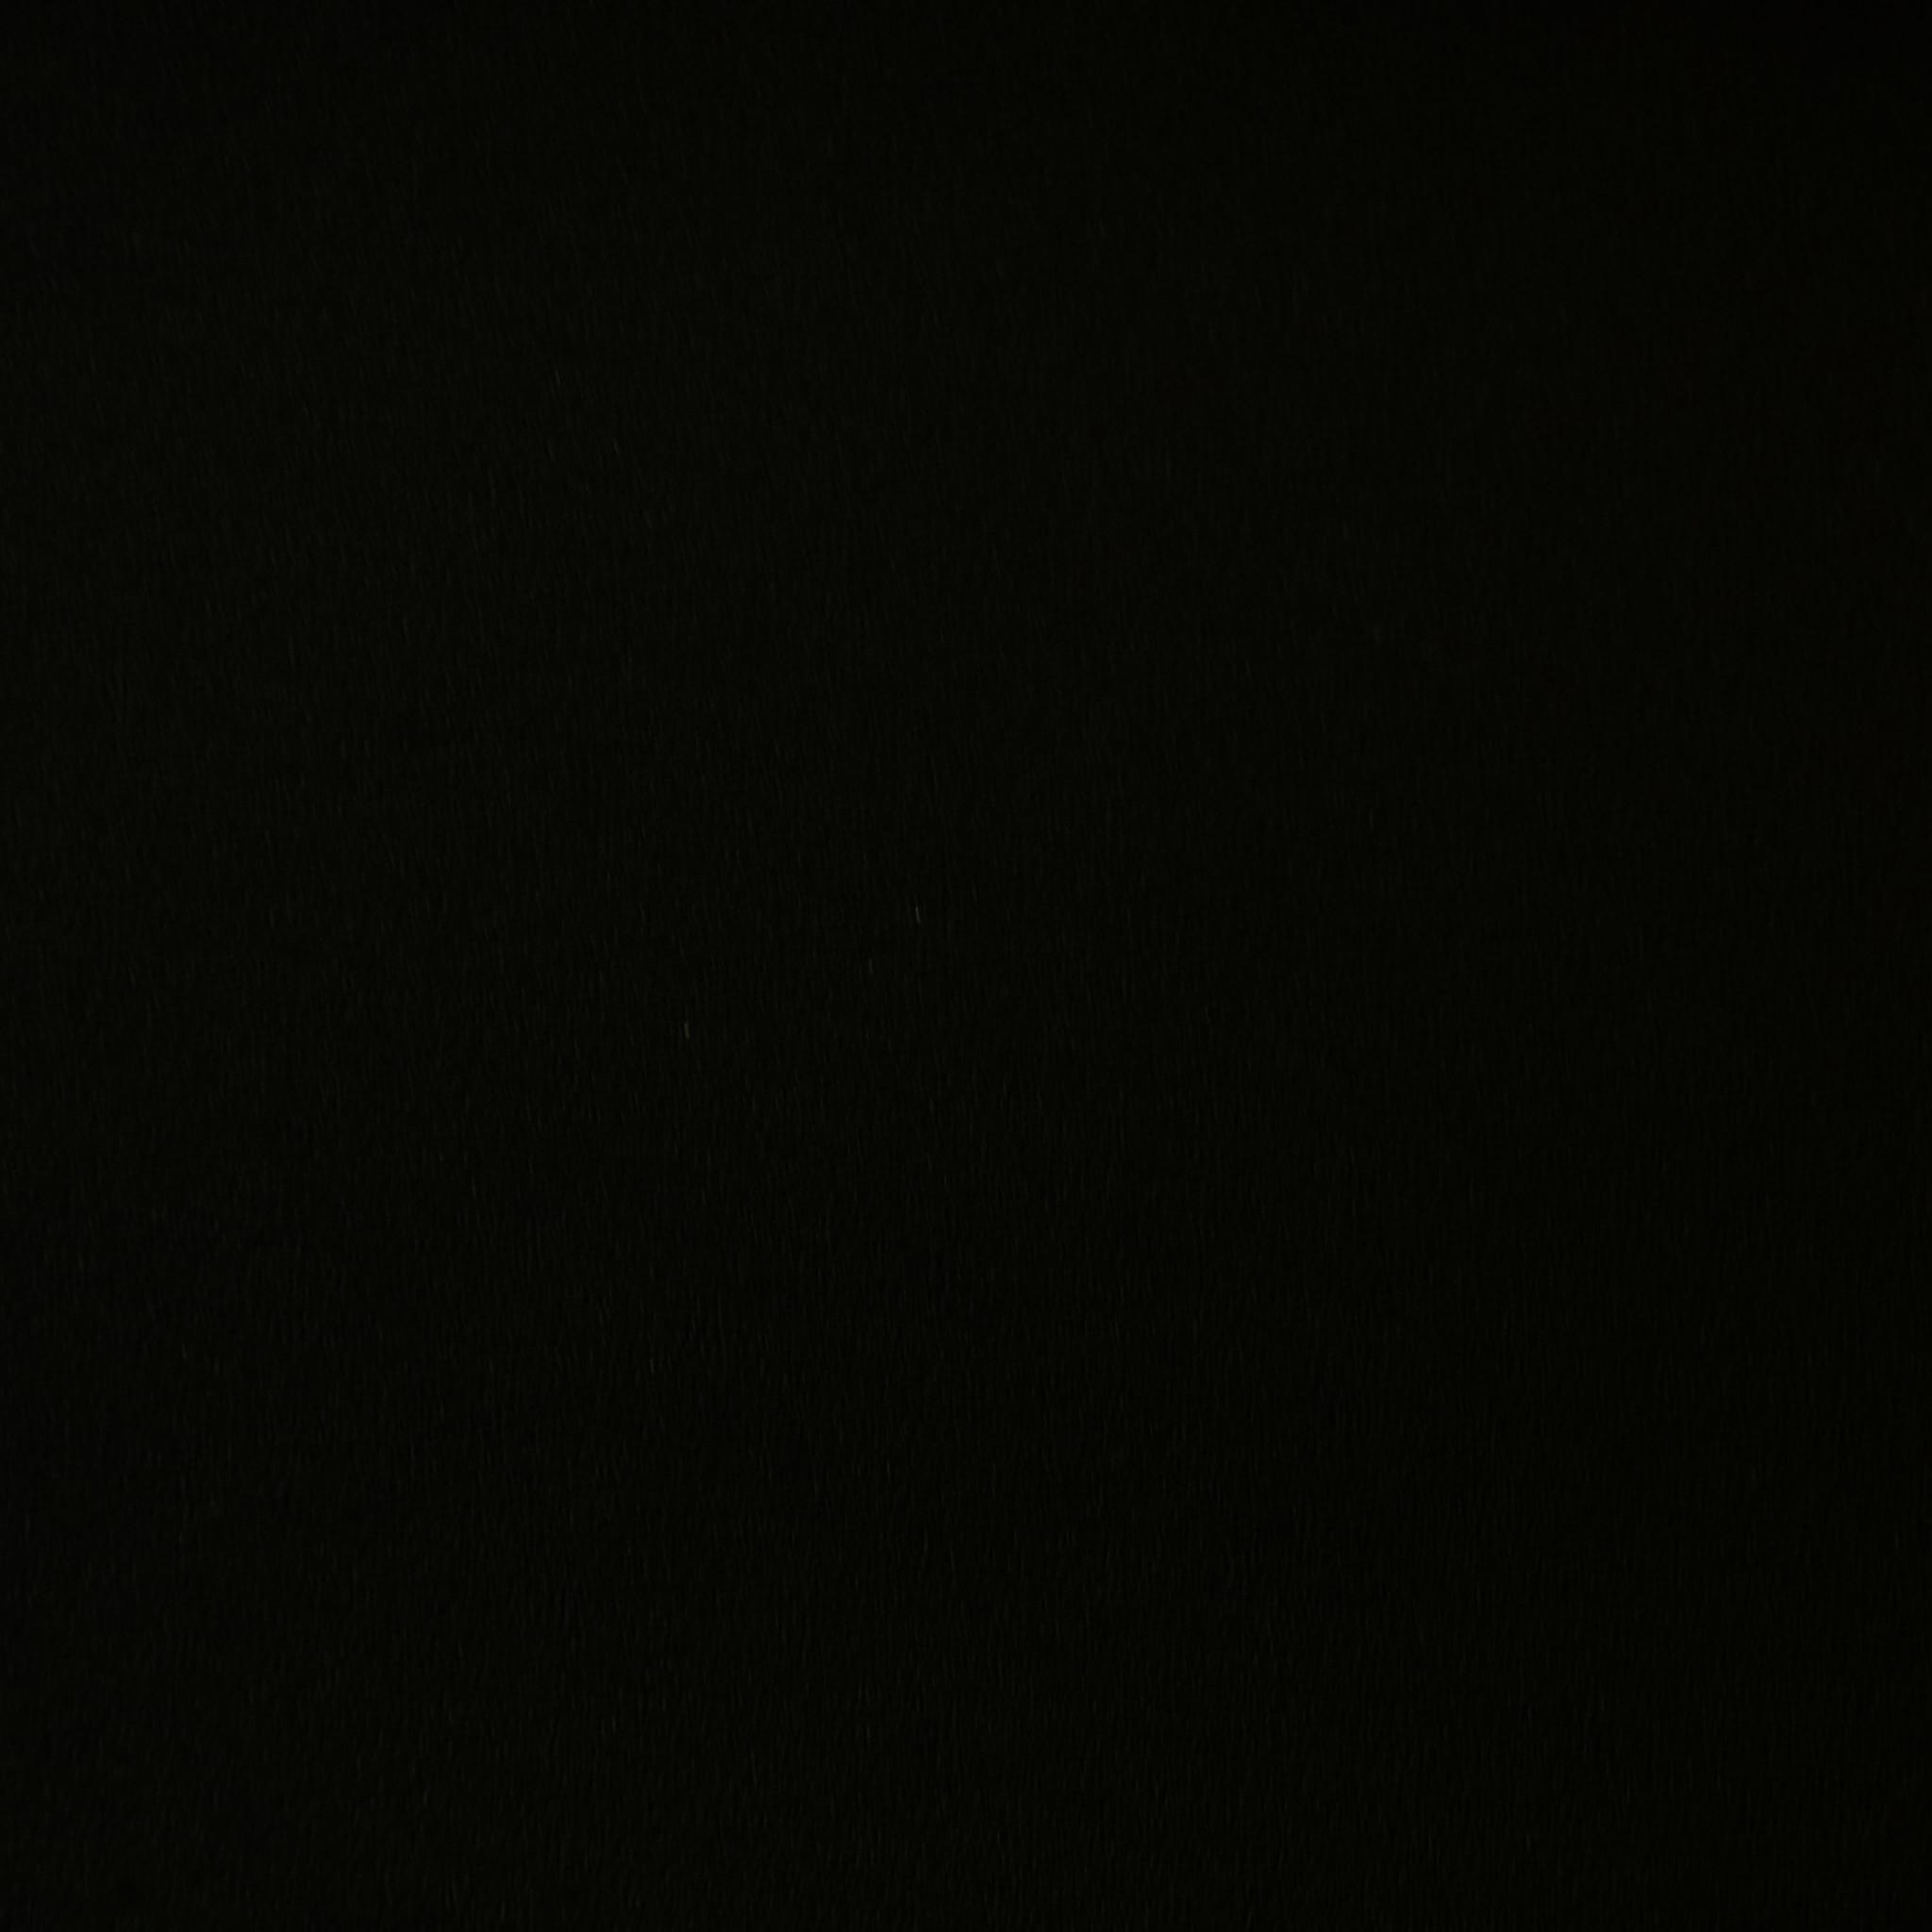 Film intérieur Rough Dark Black